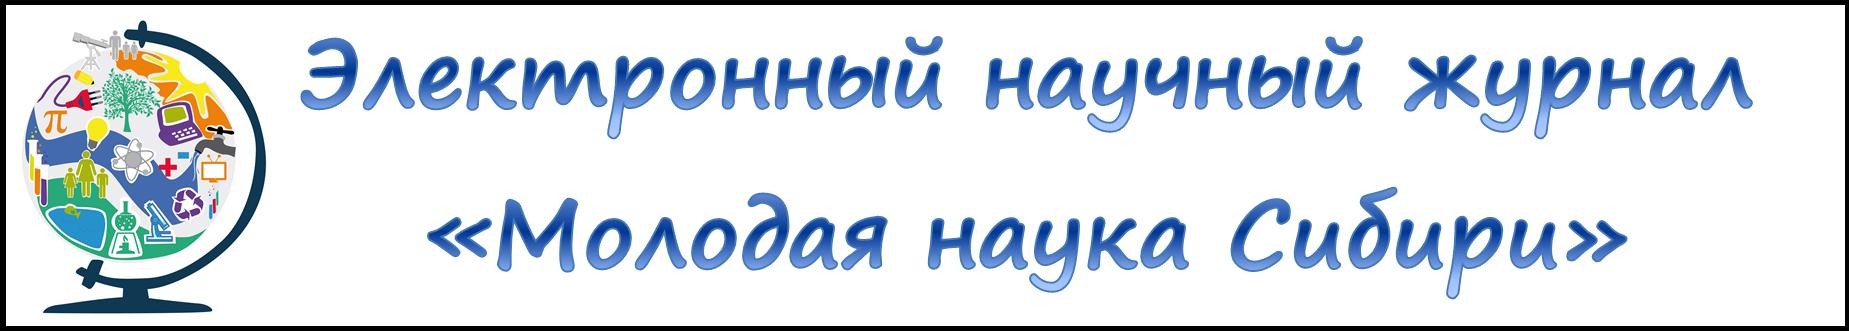 Электронный научный журнал «Молодая наука Сибири»